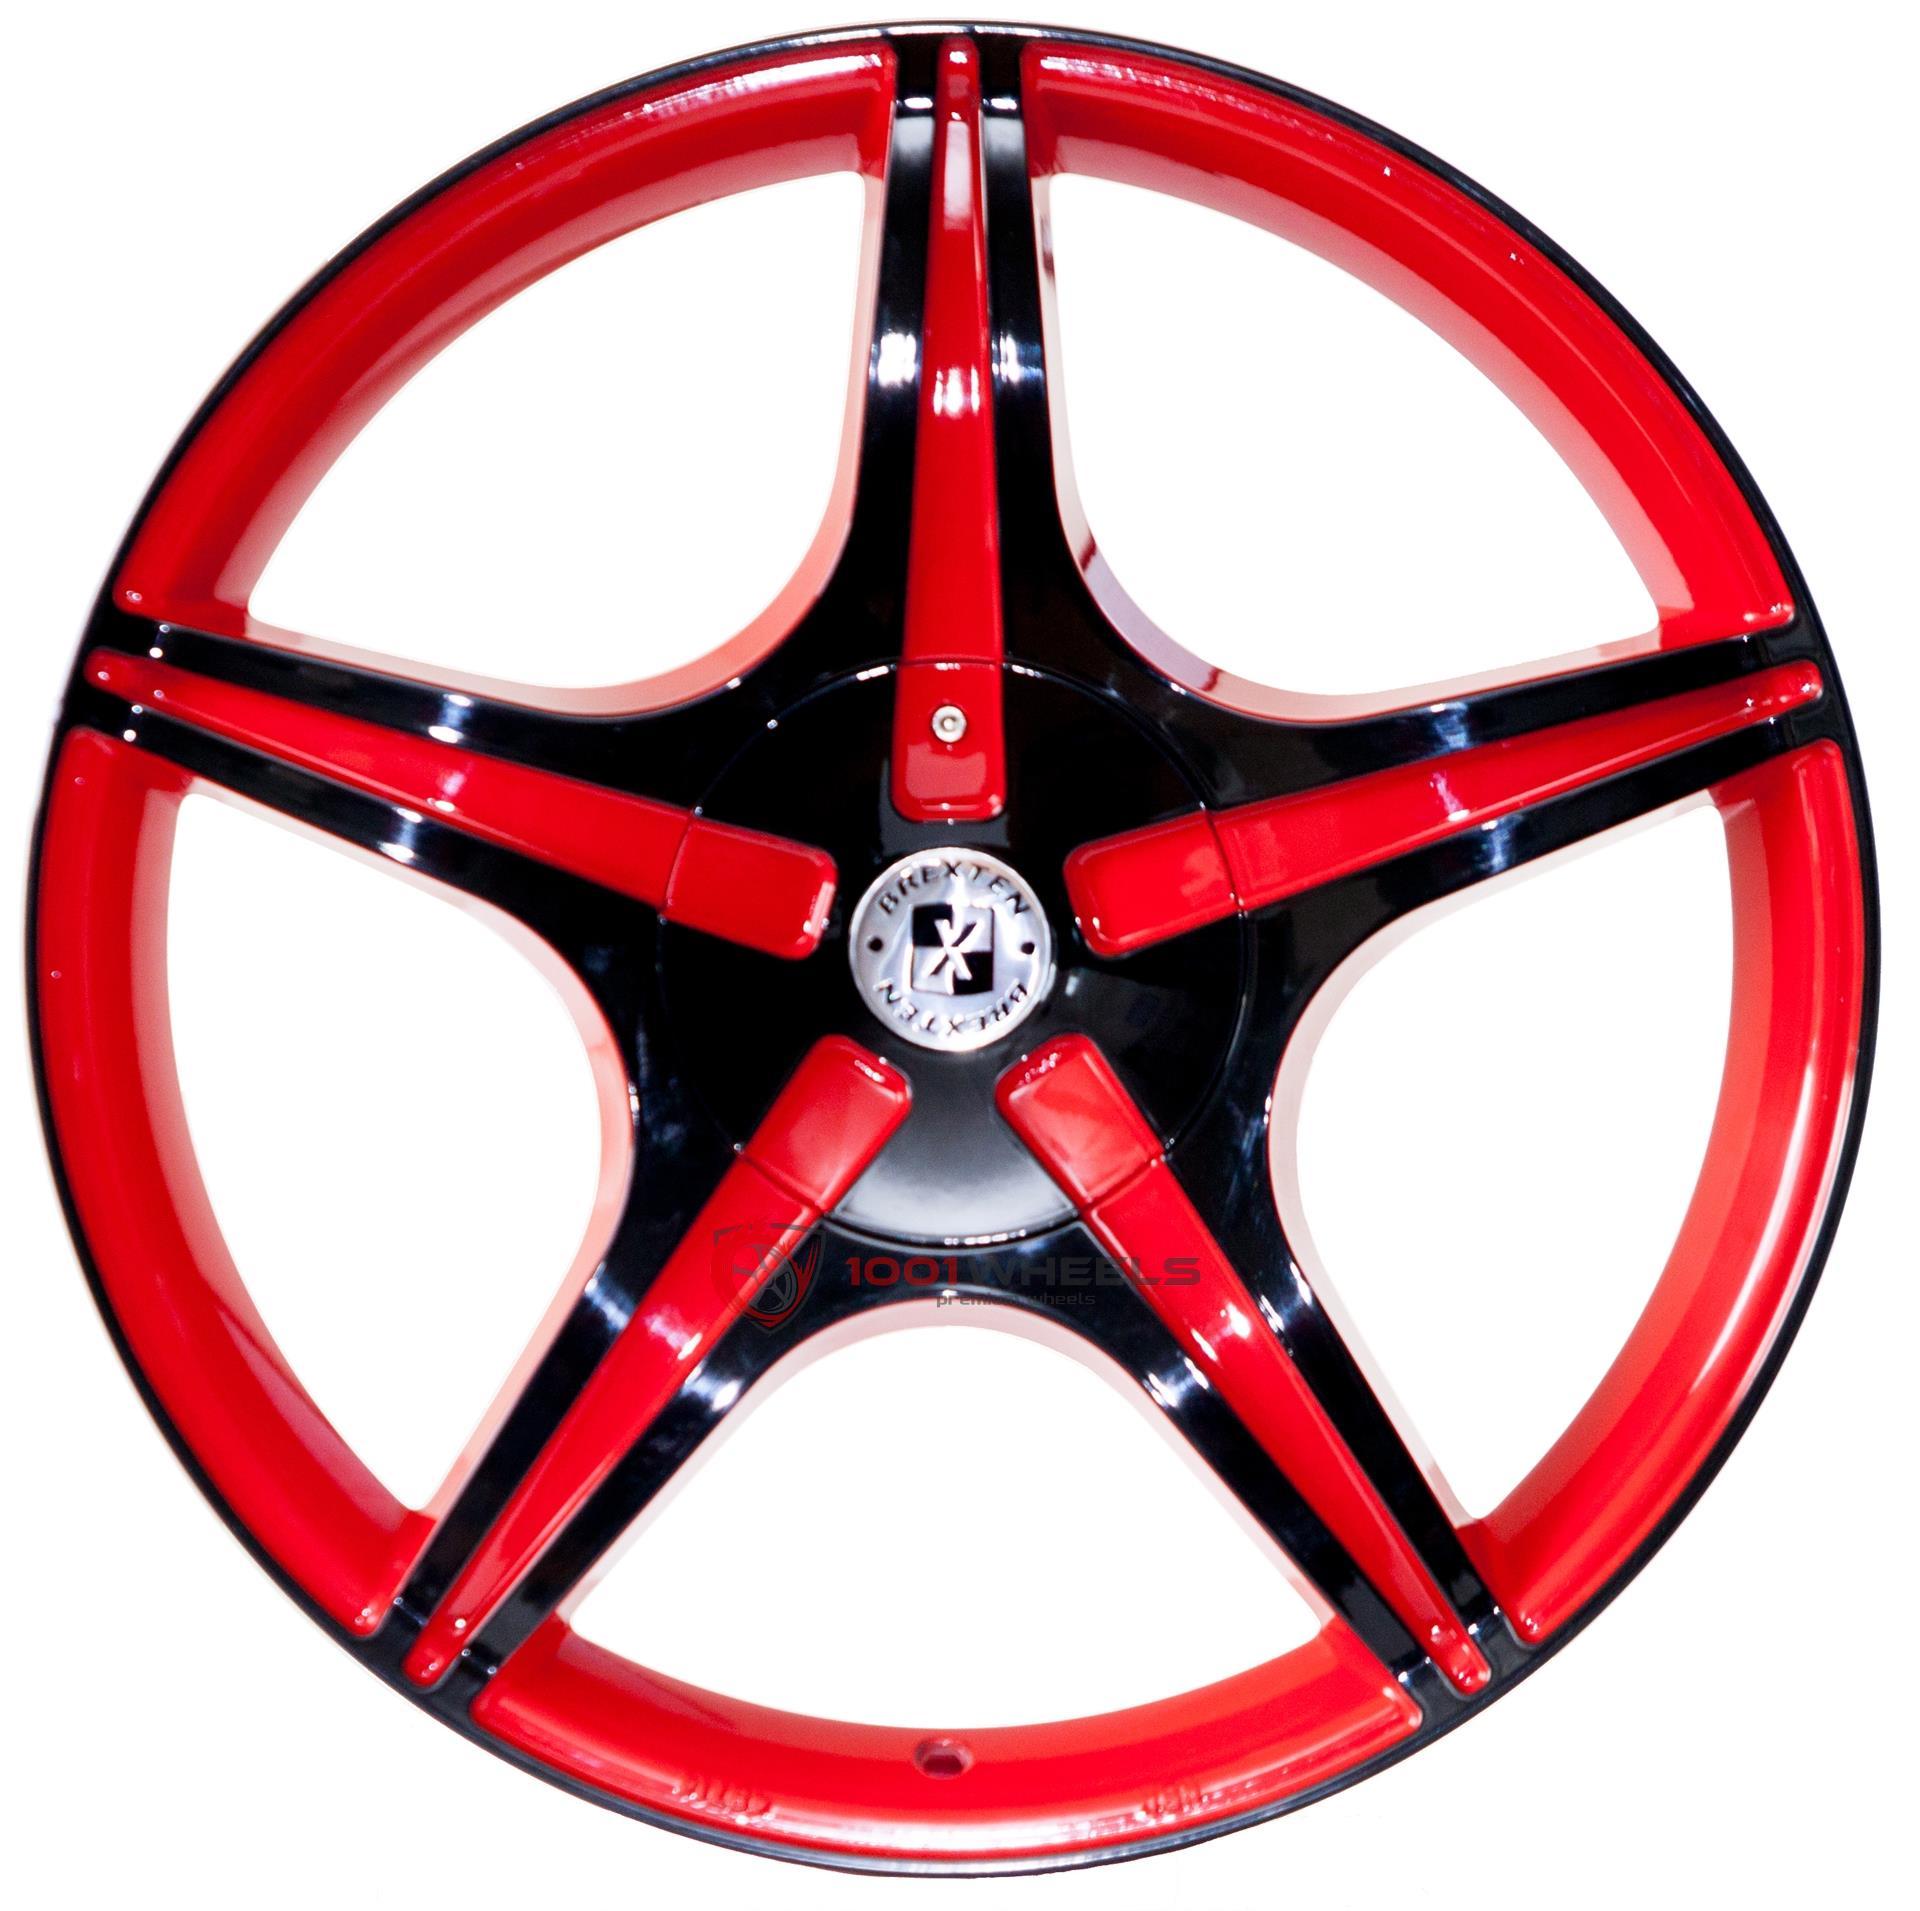 BREXTEN CUSTOM BX-5 red-and-black